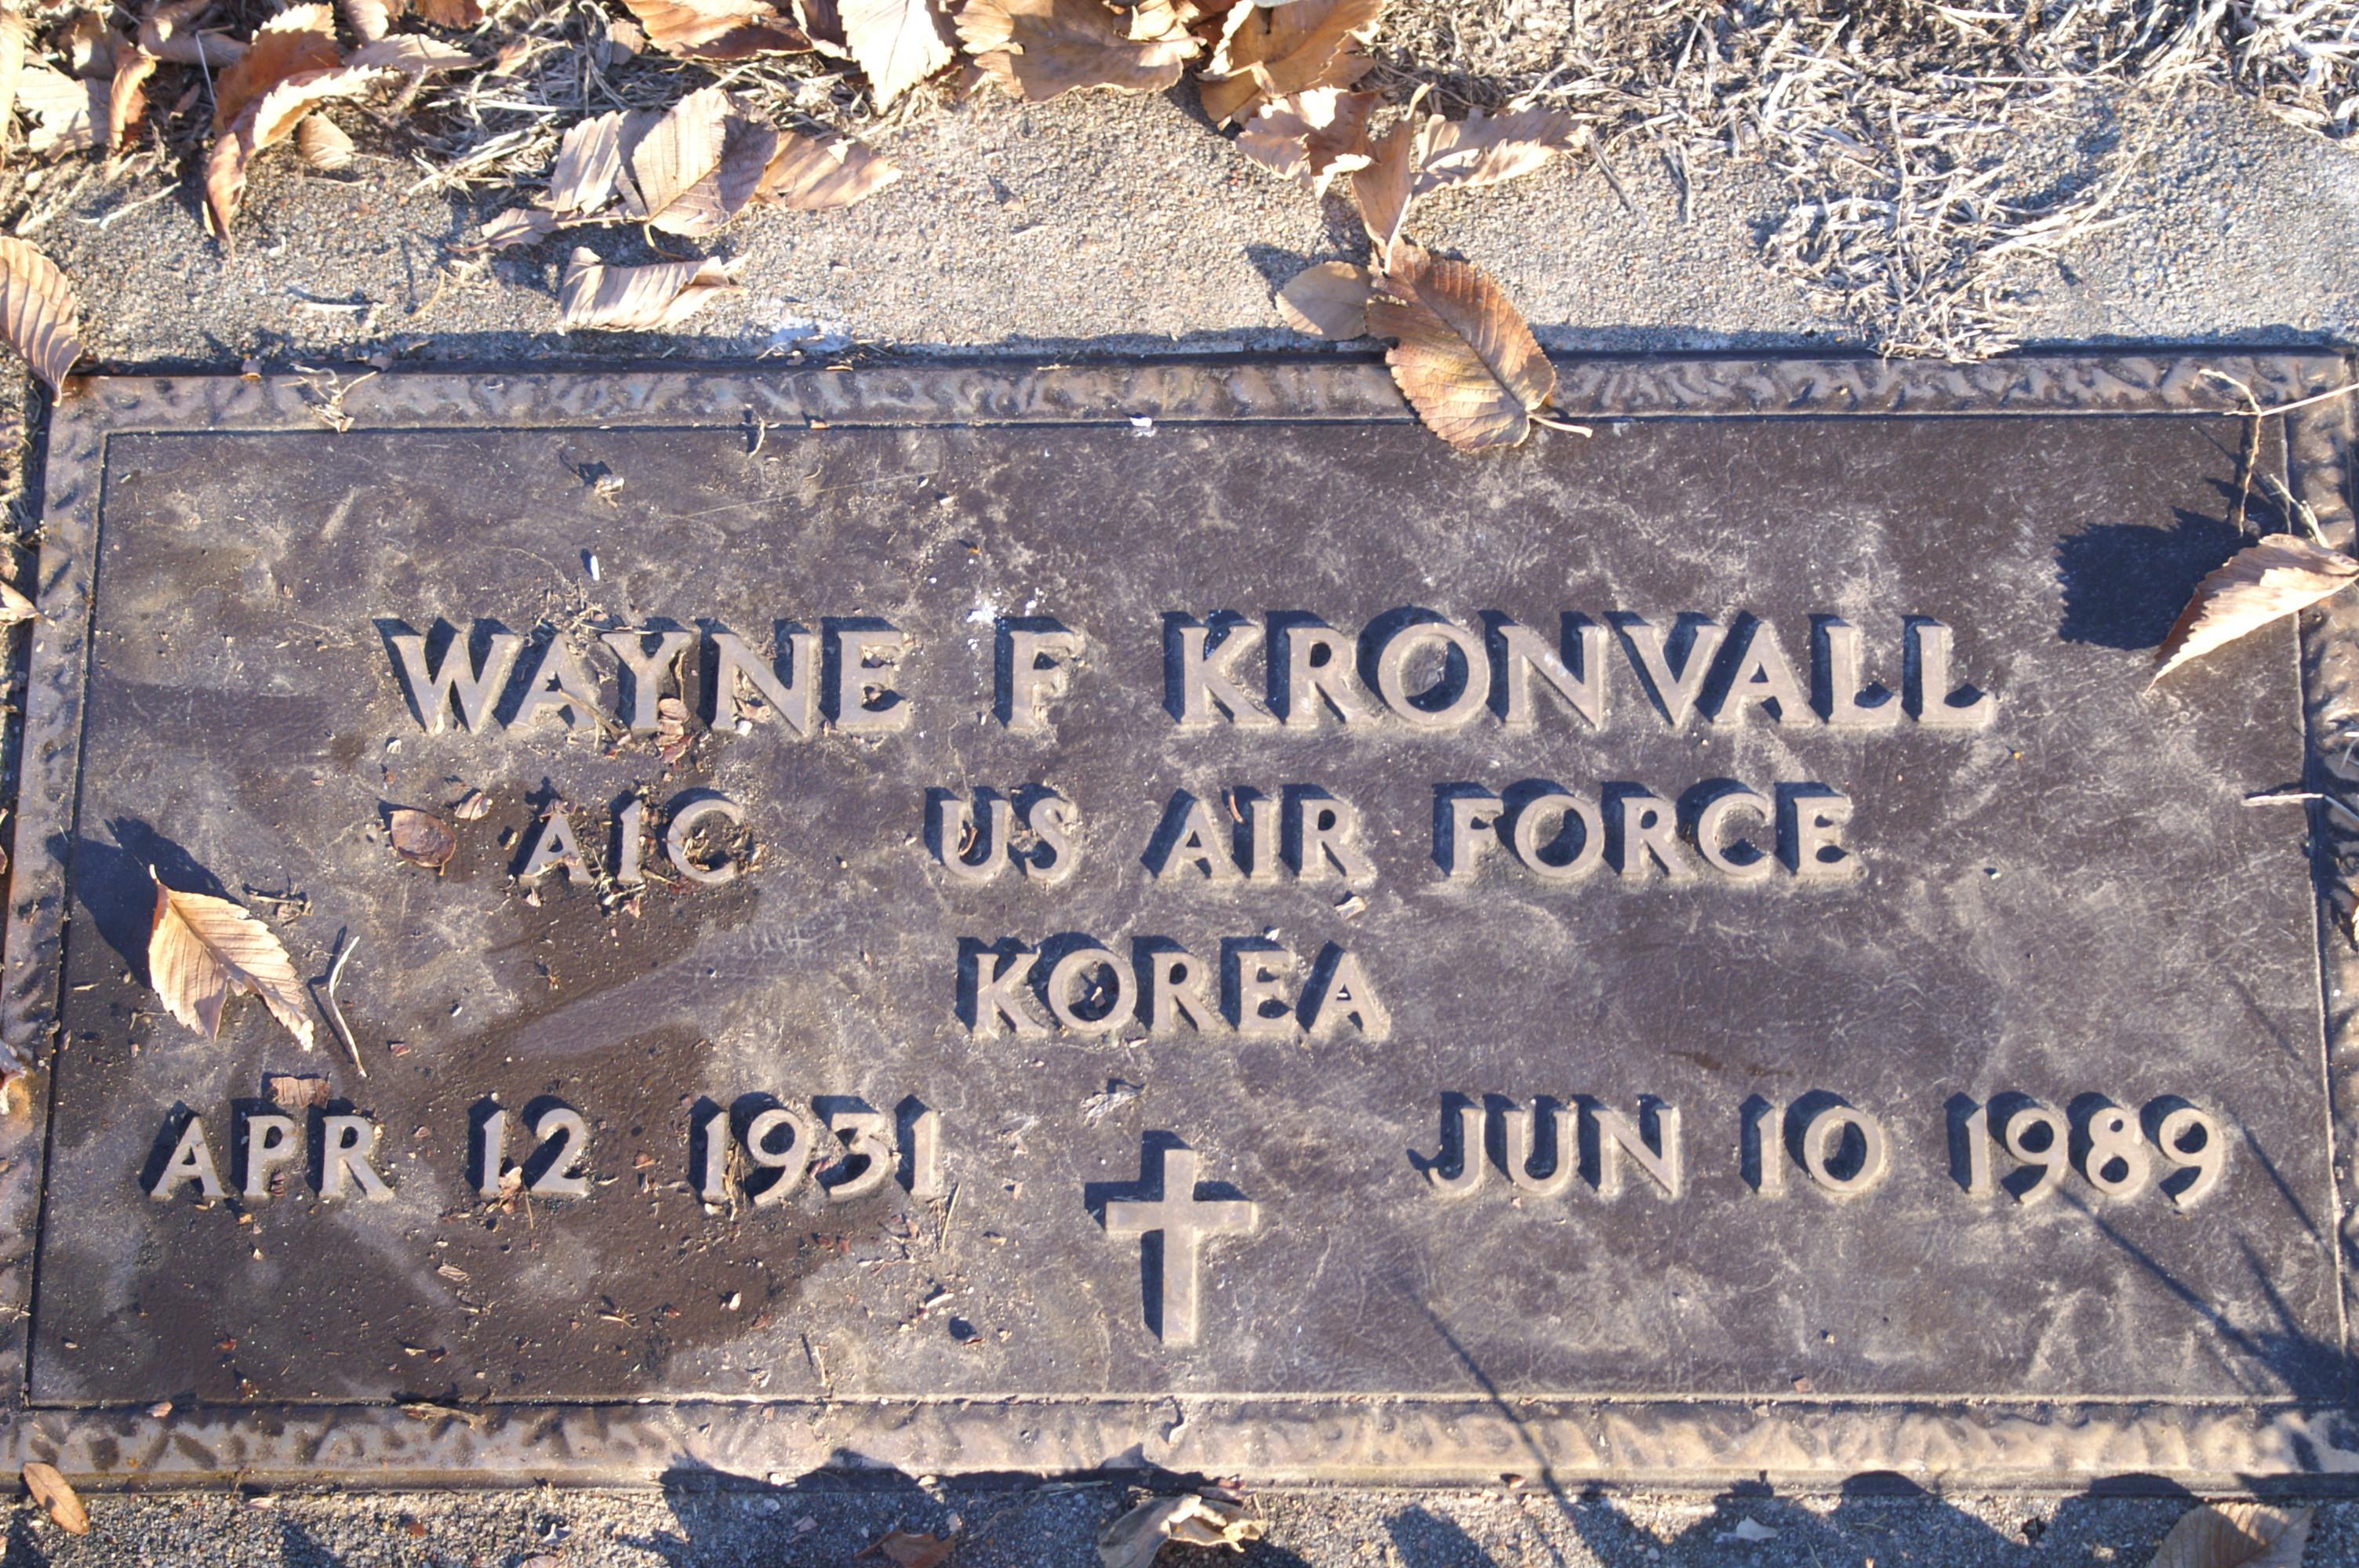 Wayne Kronvall